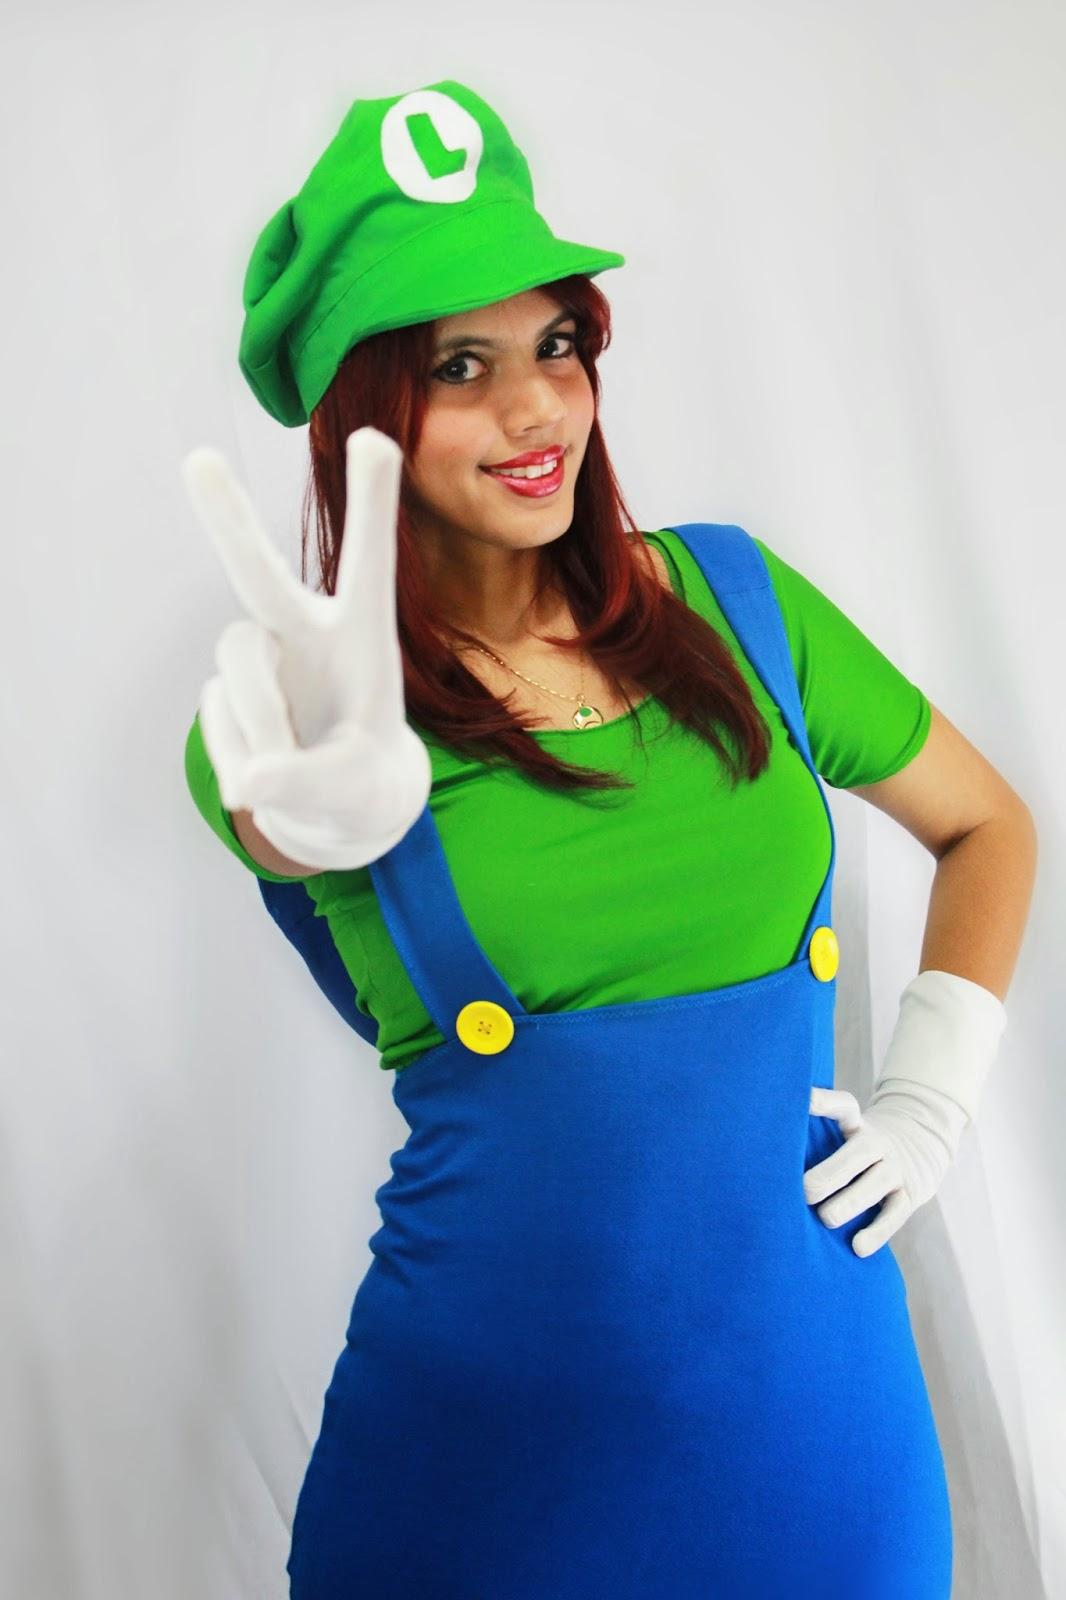 SetCosplay   TUTORIAL  Boina (Cap) do Luigi Mario + Roupa Cosplay c80021ecfa3